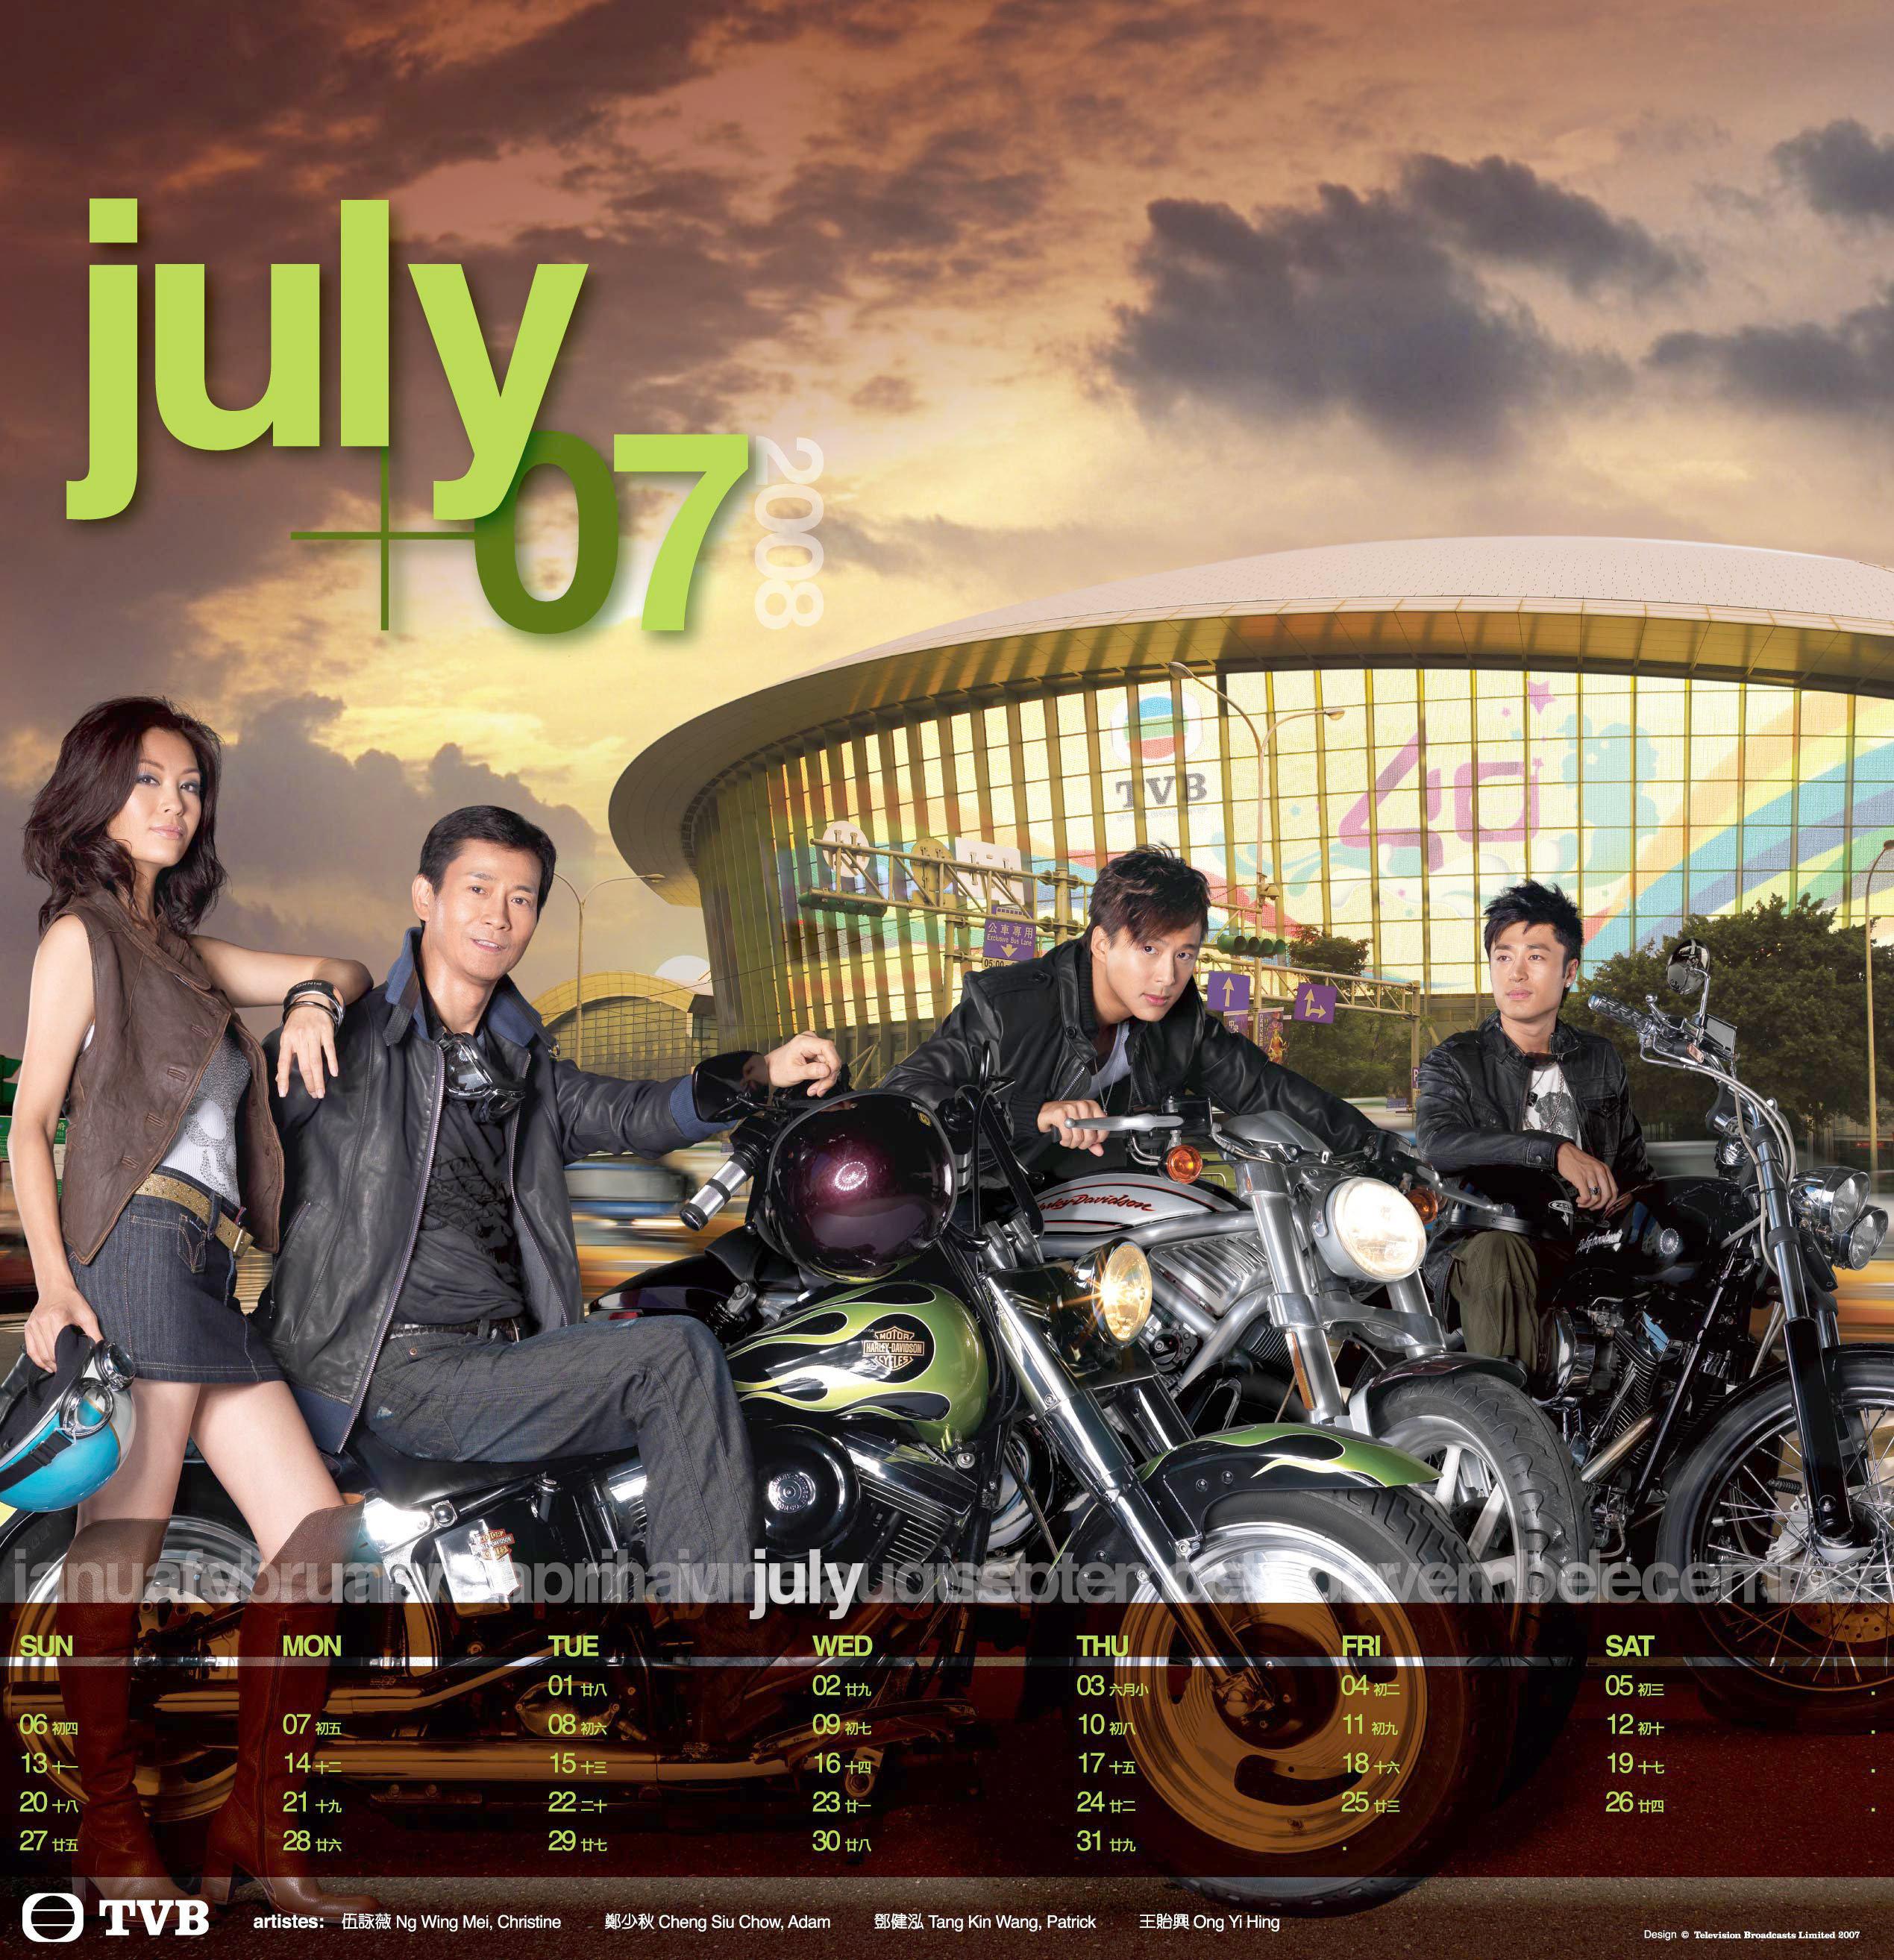 Hong Kong TVB calendar July 2008